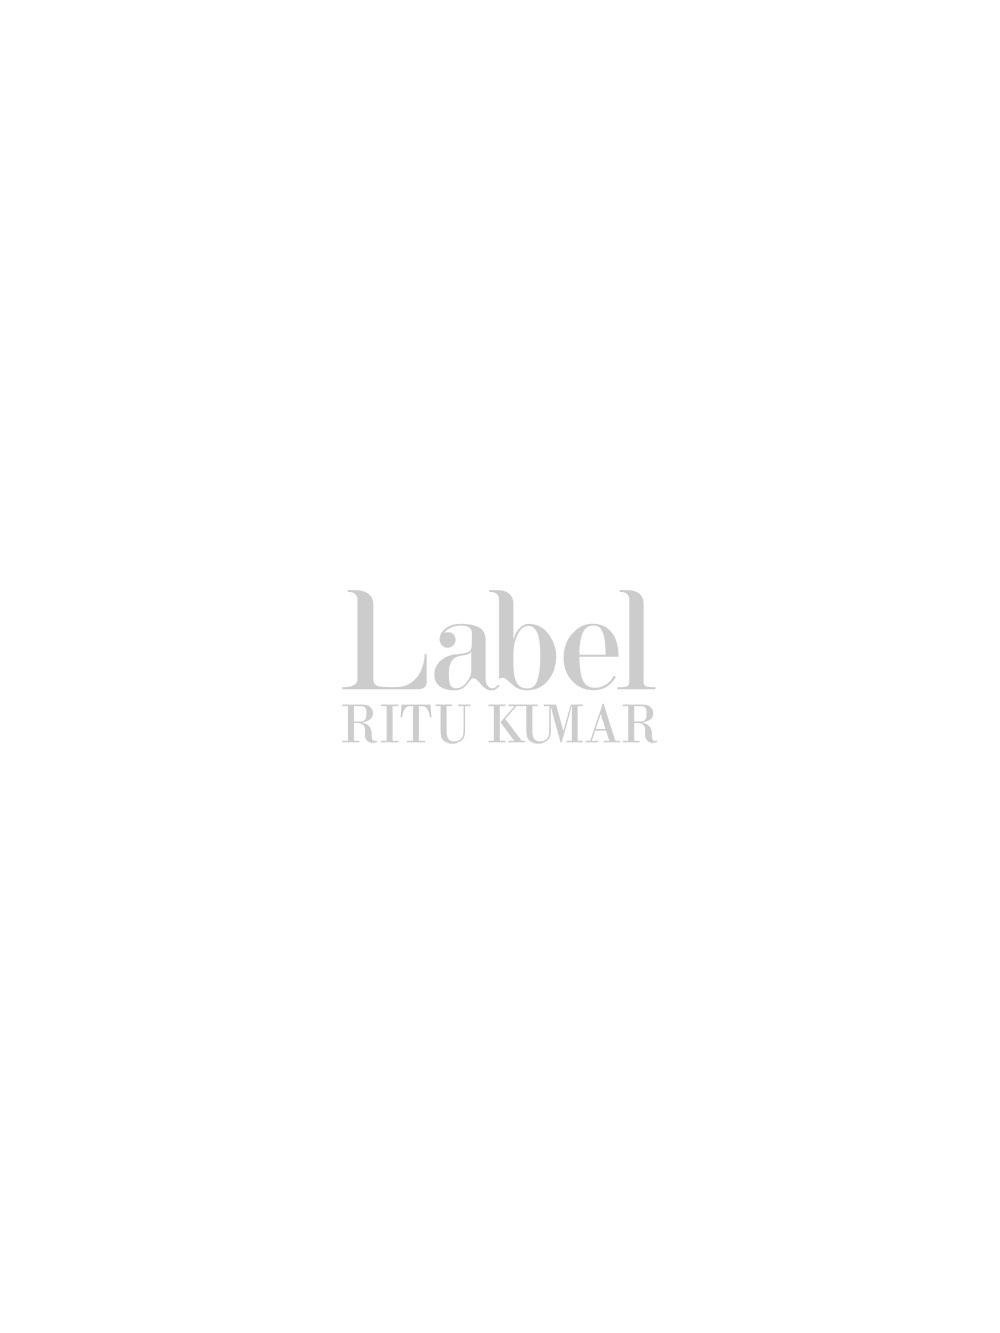 Designer Sequin Party Wear Dresses by Label Ritu Kumar